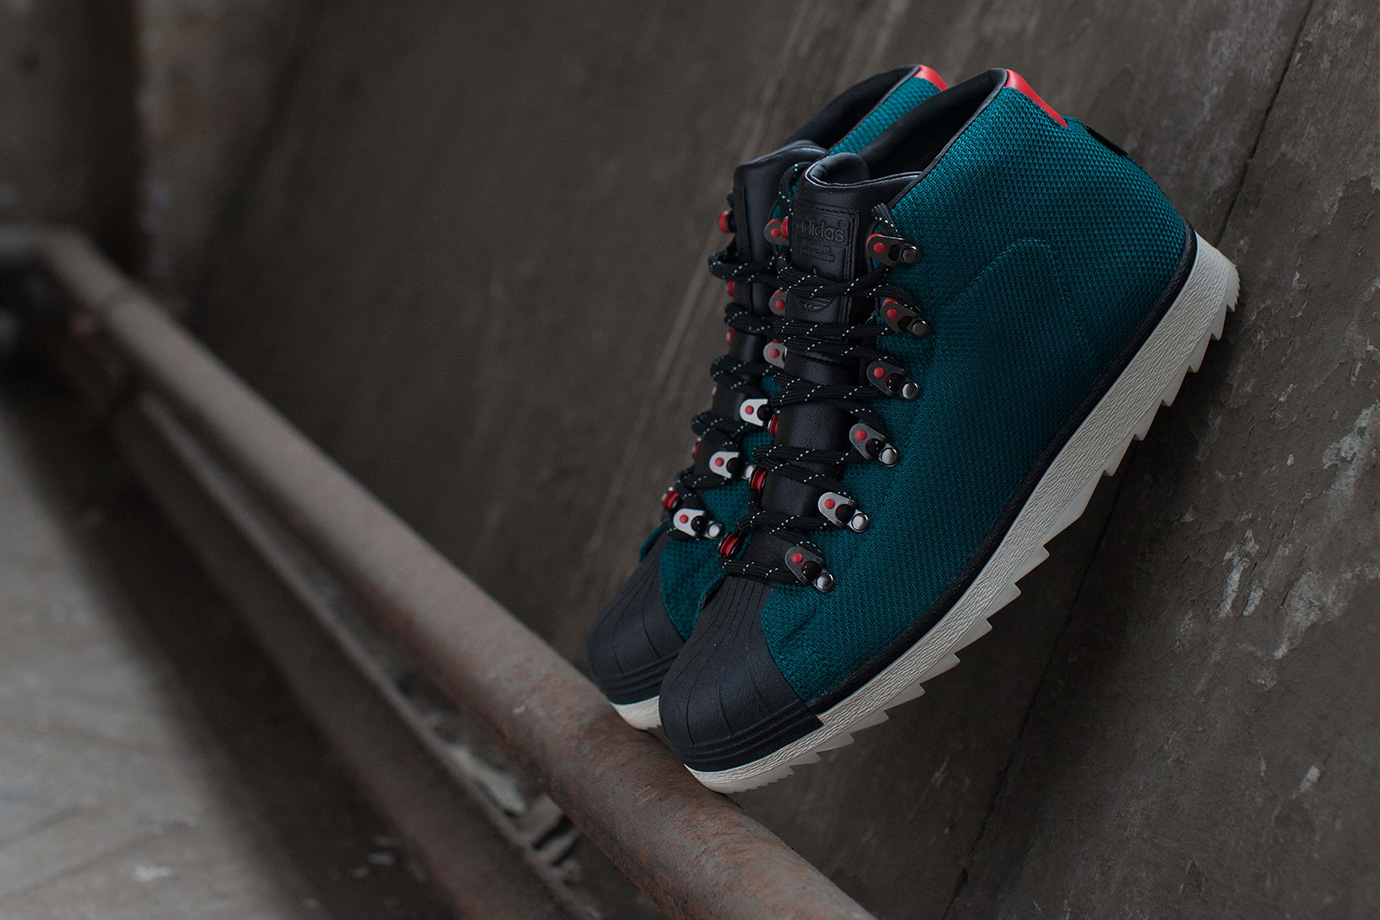 adidas Originals 2015 Fall Pro Model GTX Collection